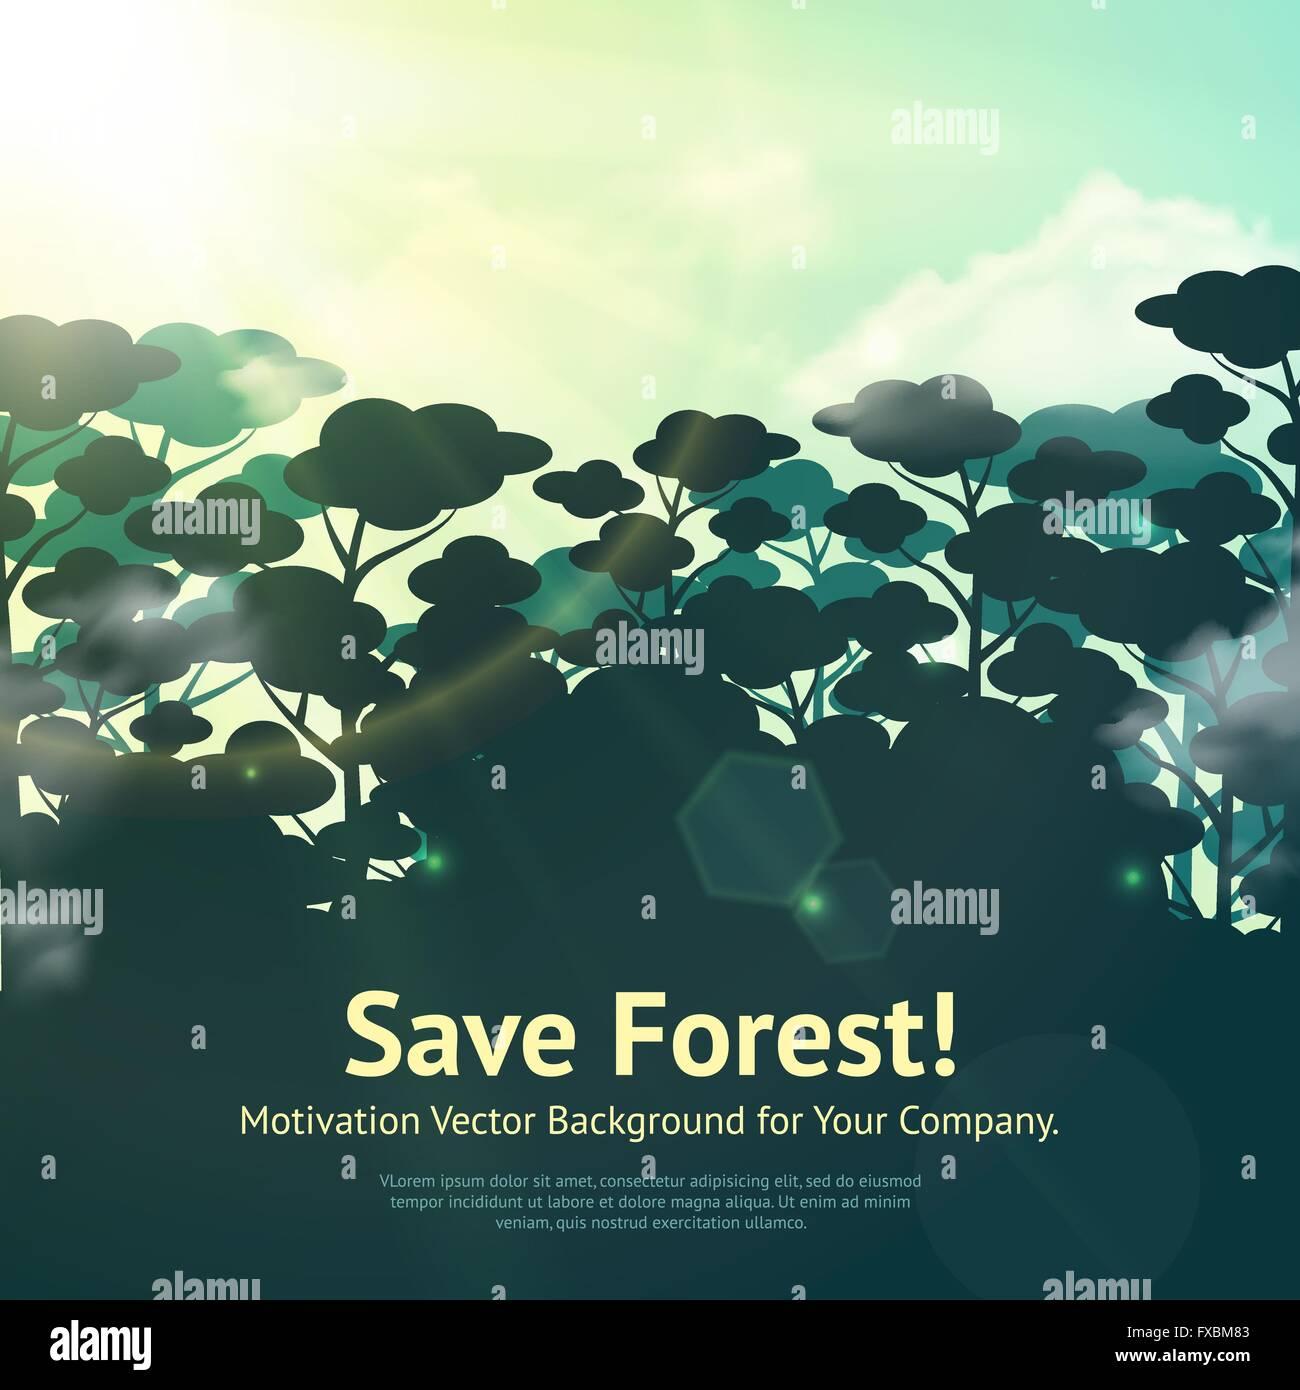 save forest illustration stock vector art illustration vector